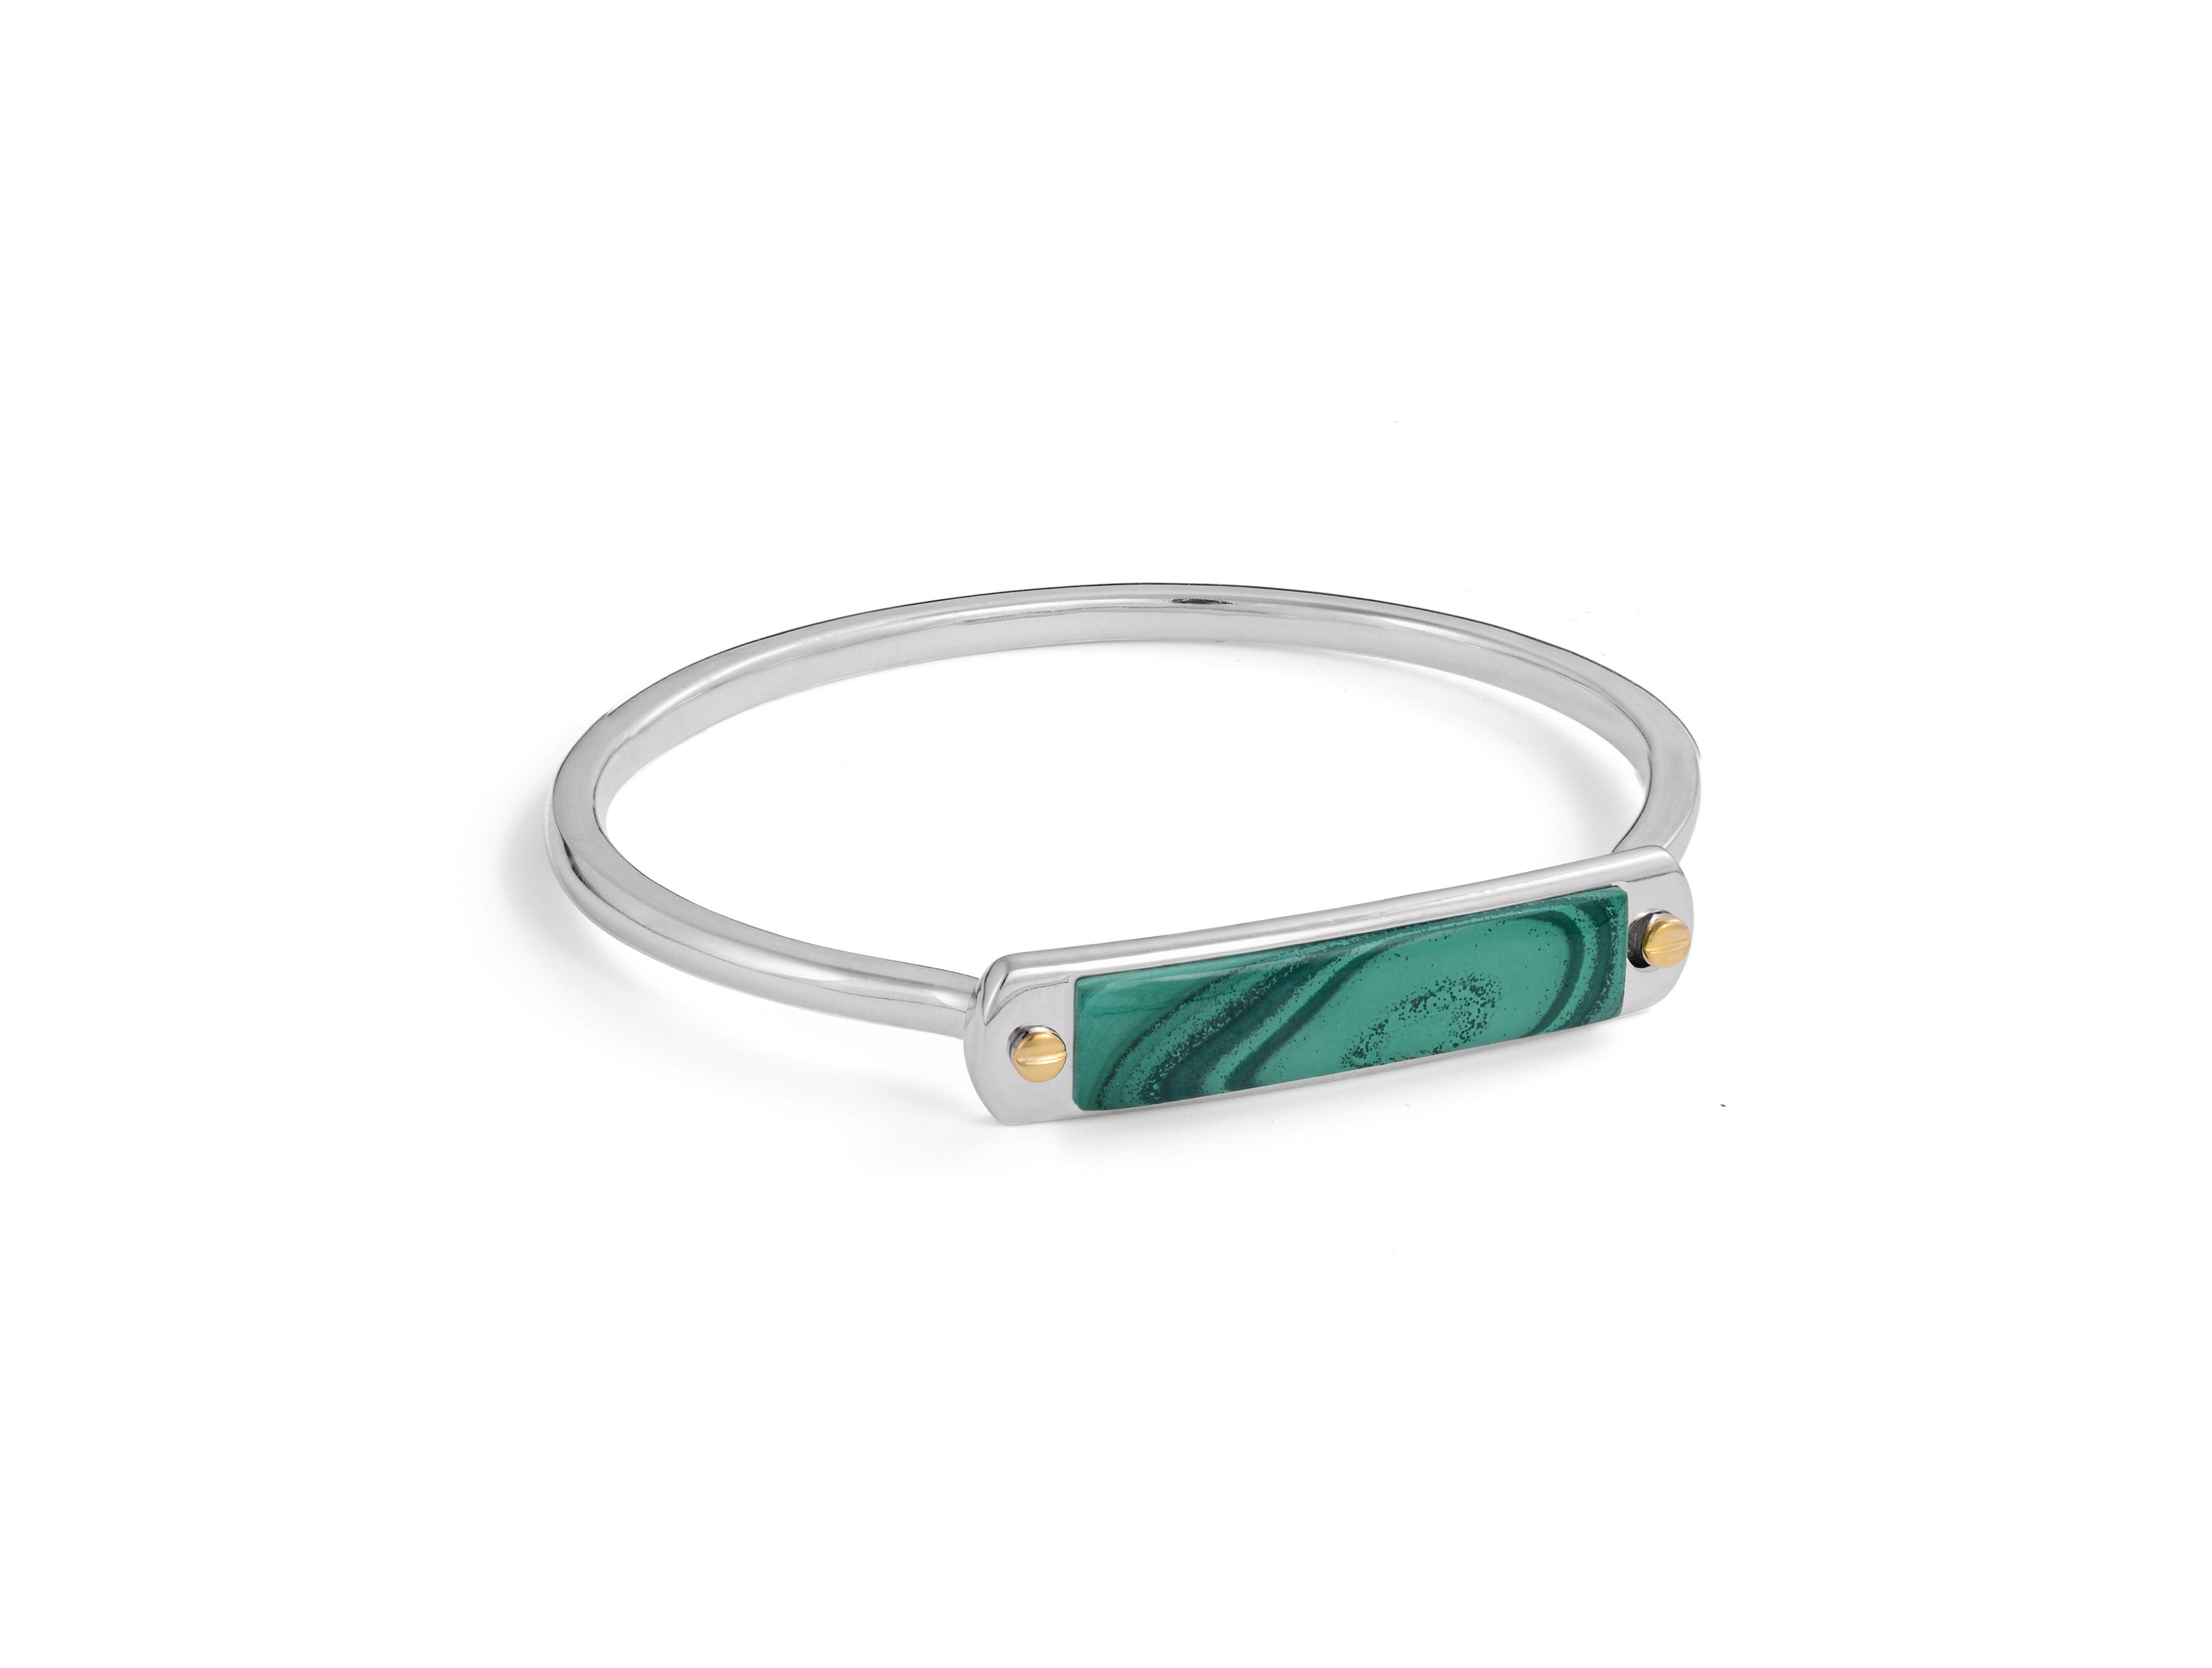 Malachite Small ID Cuff Bracelet in Sterling Silver